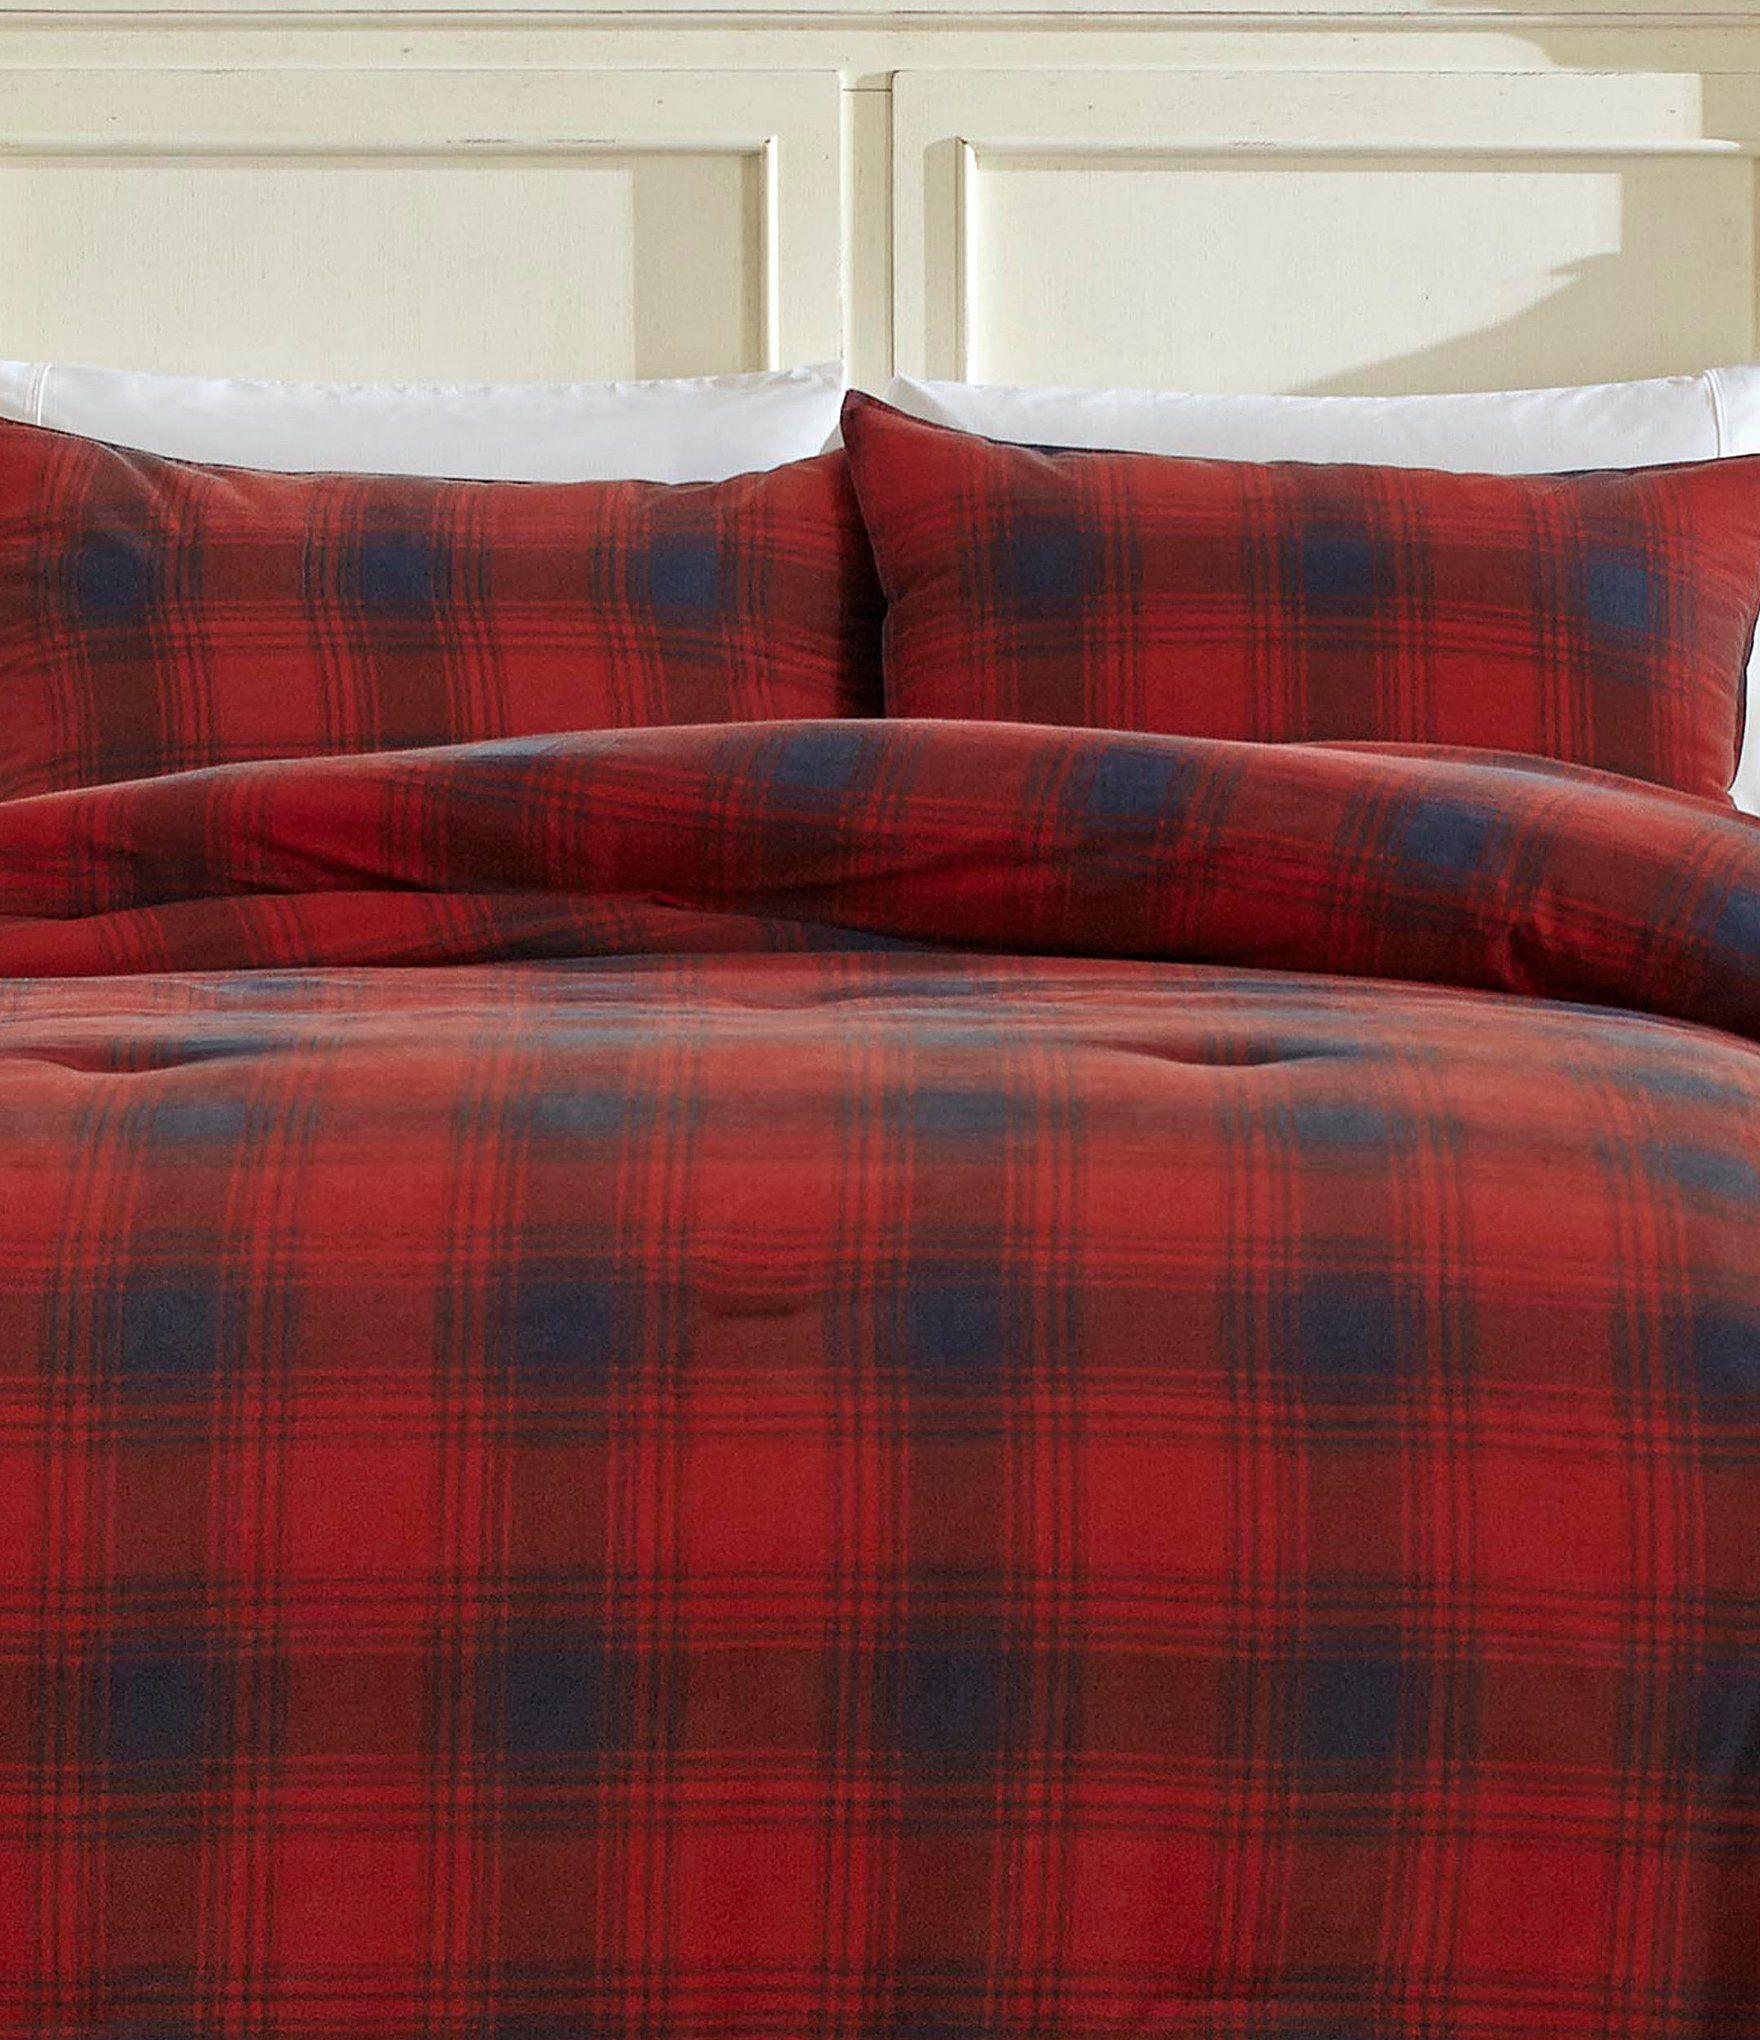 Nautica Brighton Mini Comforter Set - Red Twin/Twin Extra Long